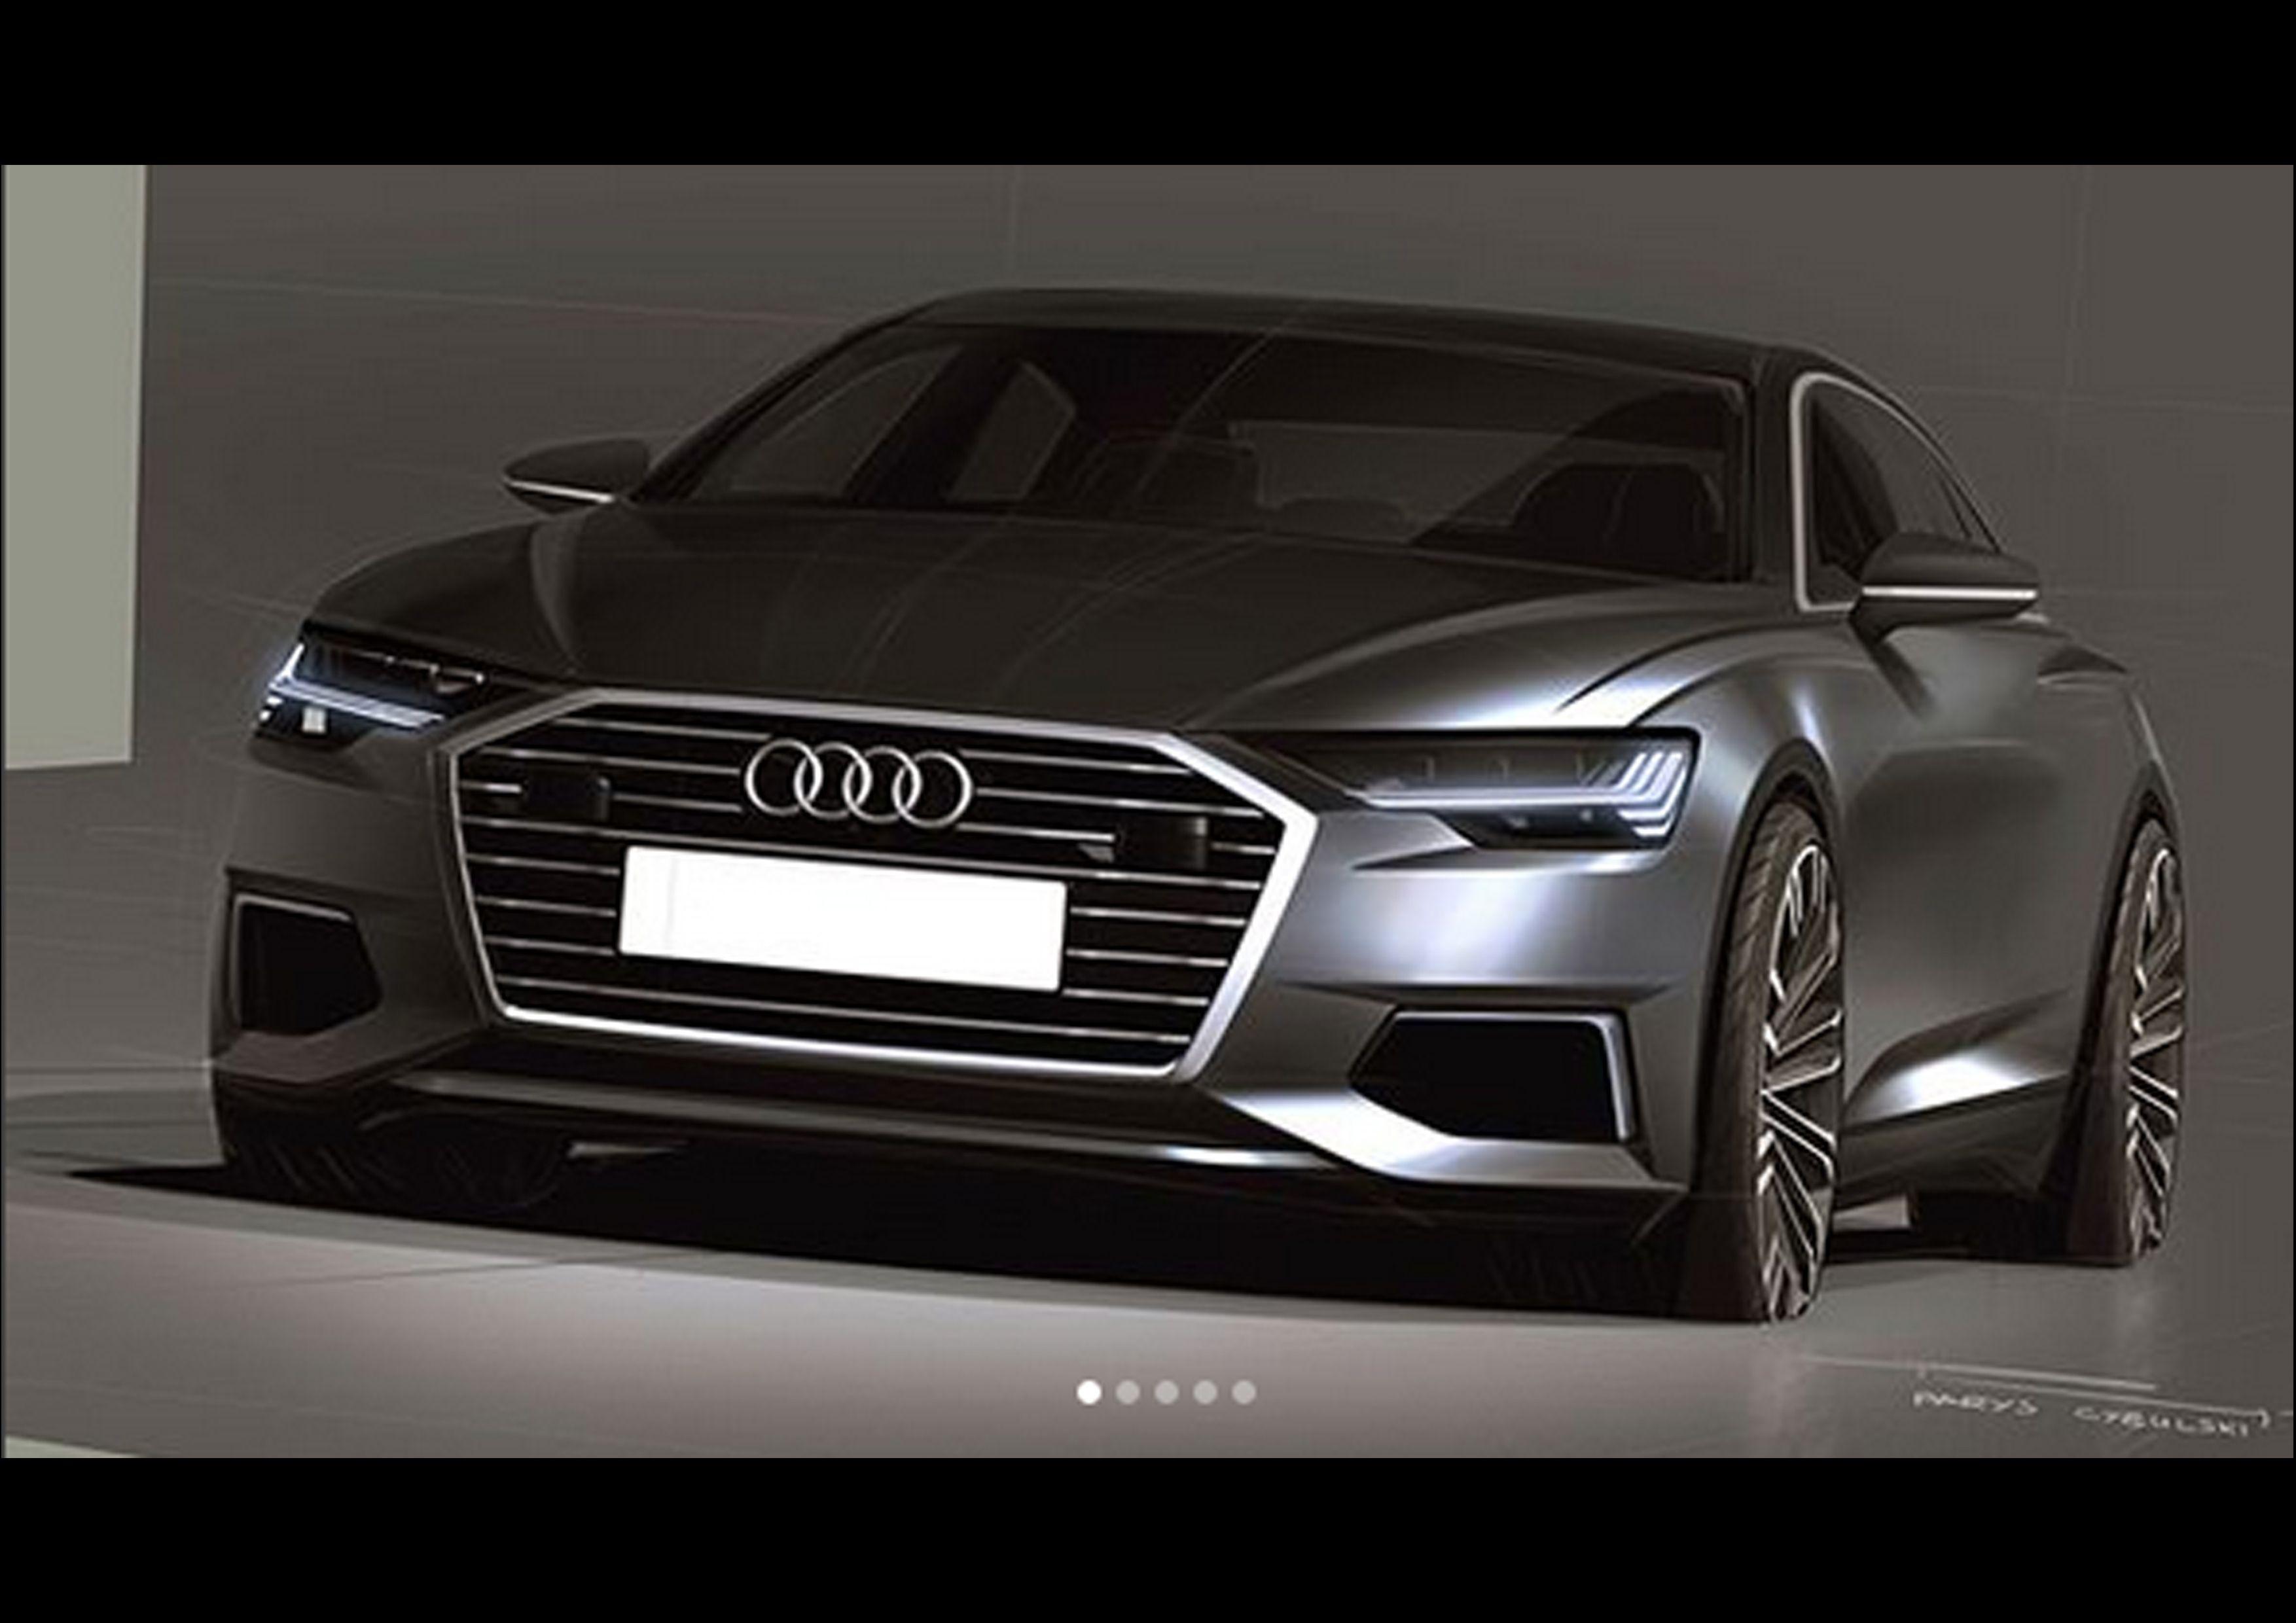 Audi A6 New Concept Car Pinterest Audi A6 Sketches And Car Sketch